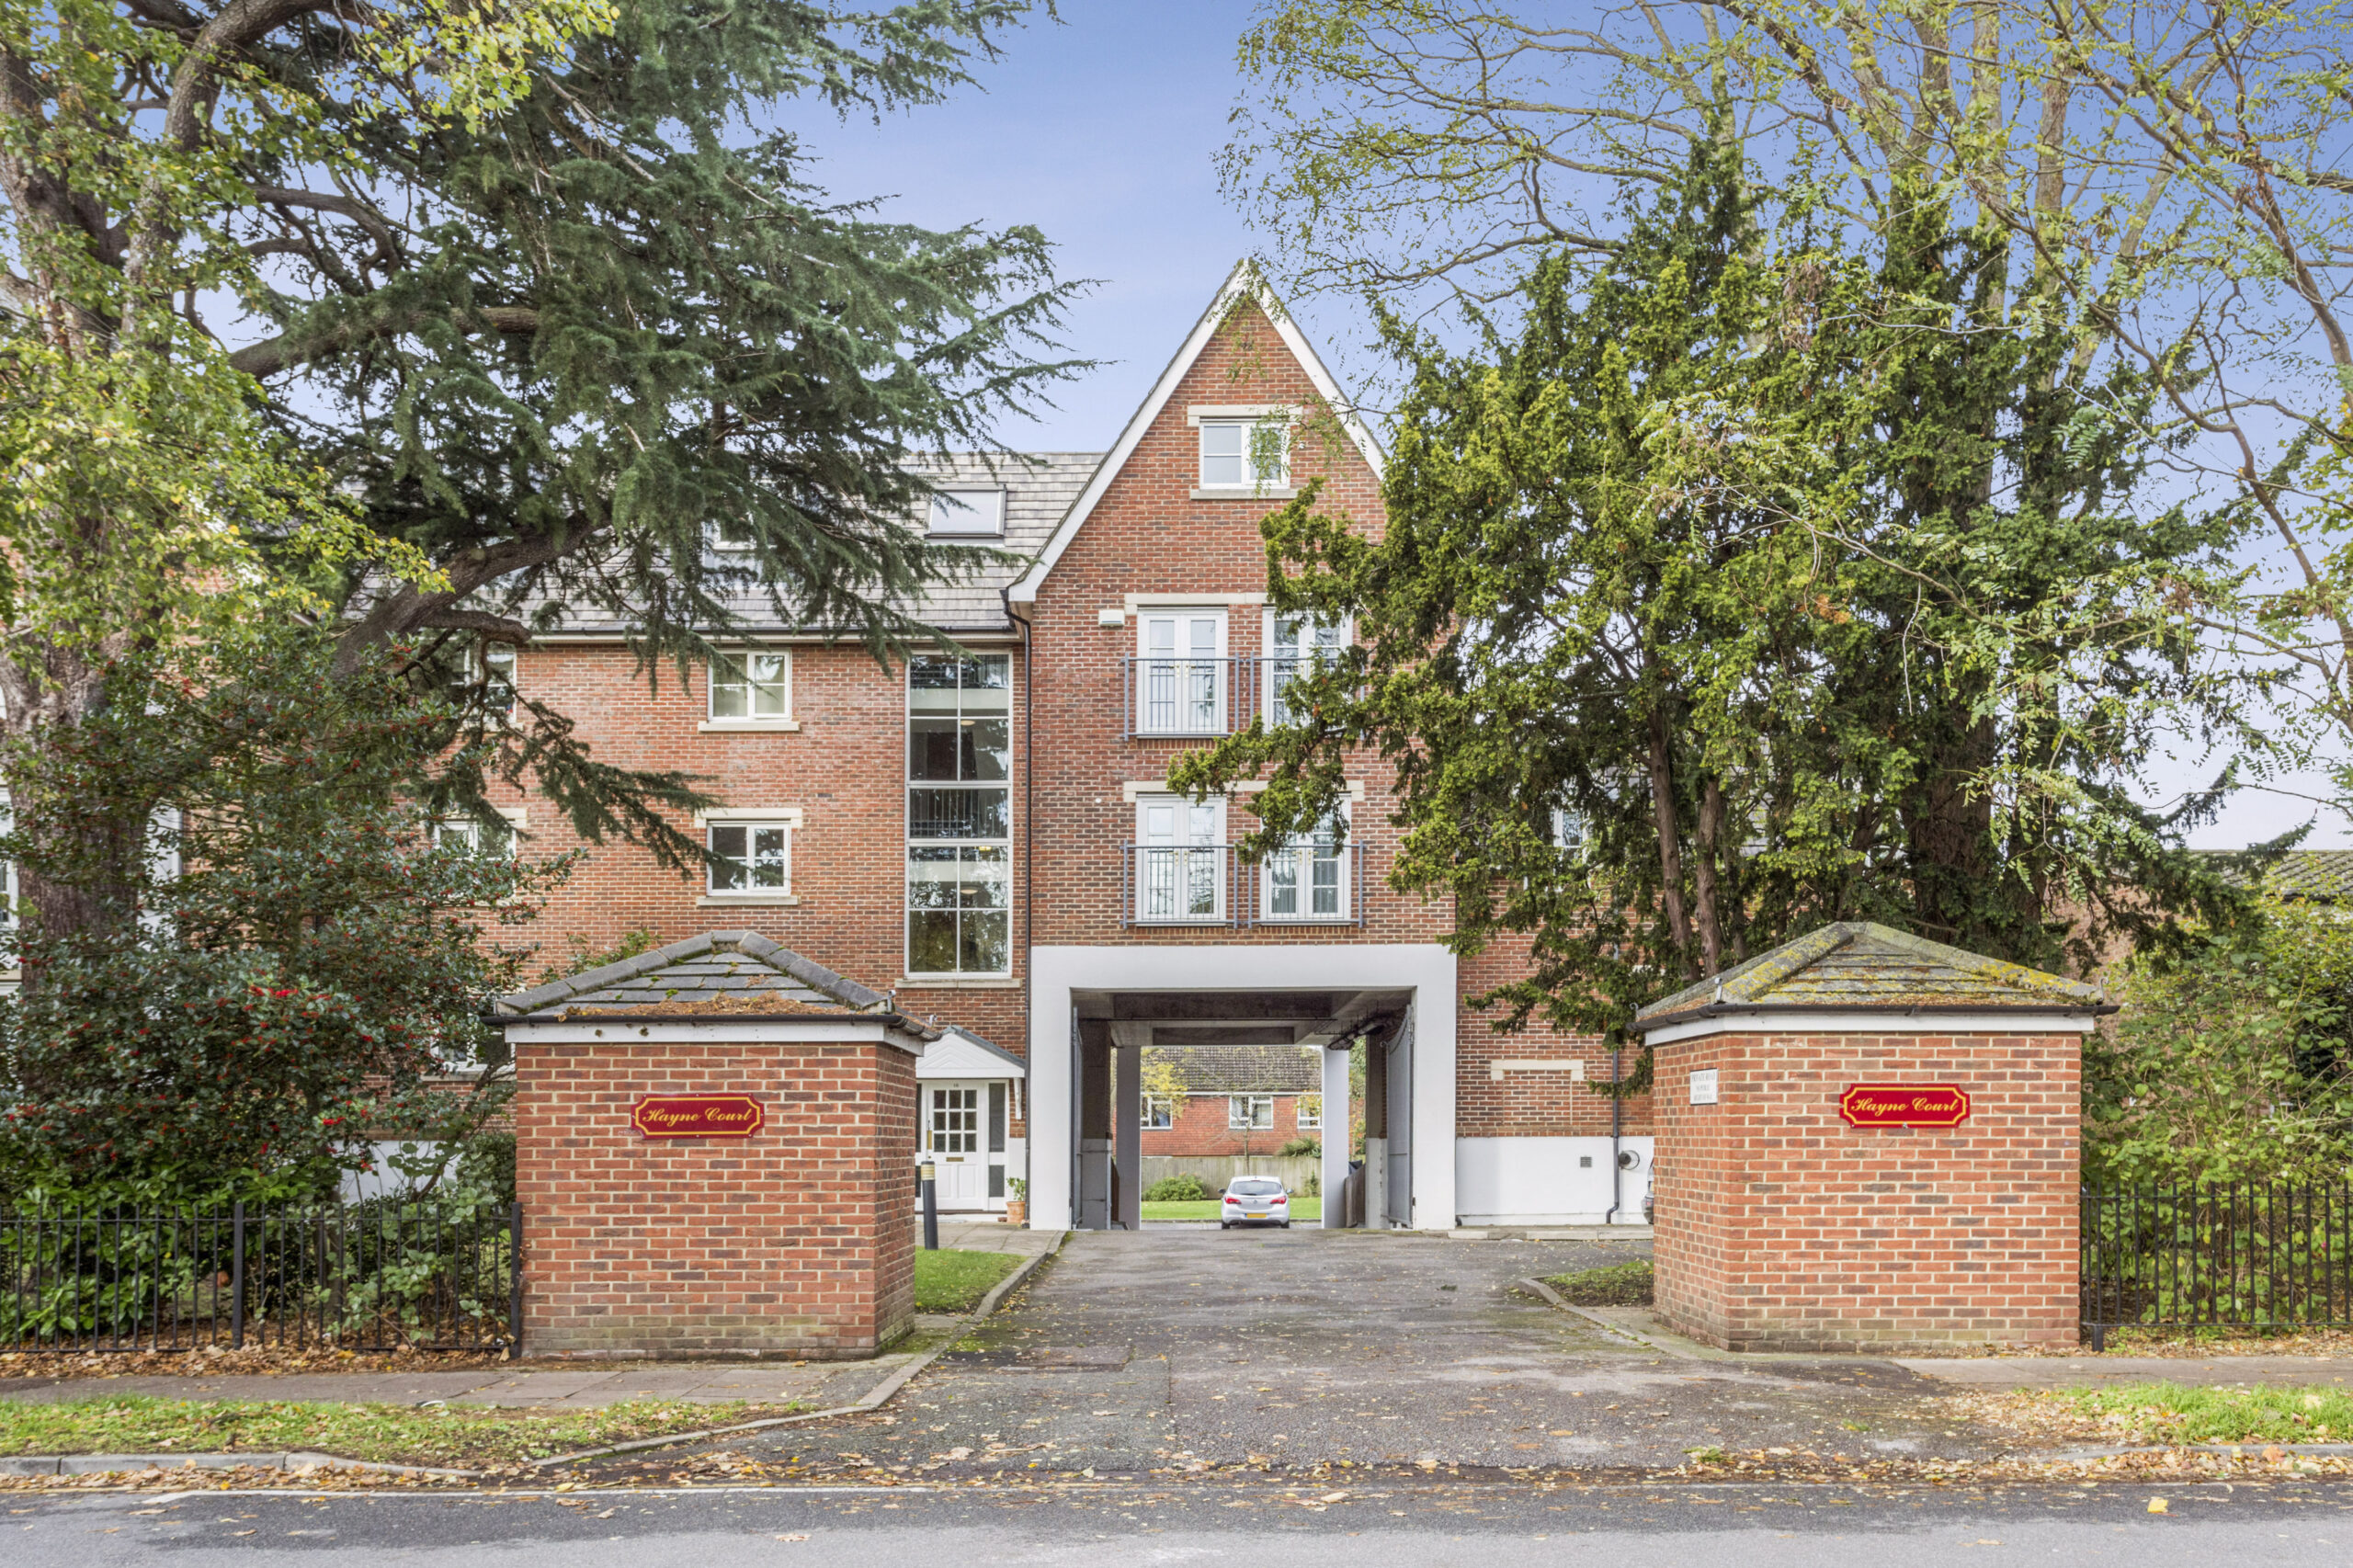 Hayne Court, Beckenham, BR3 4HY